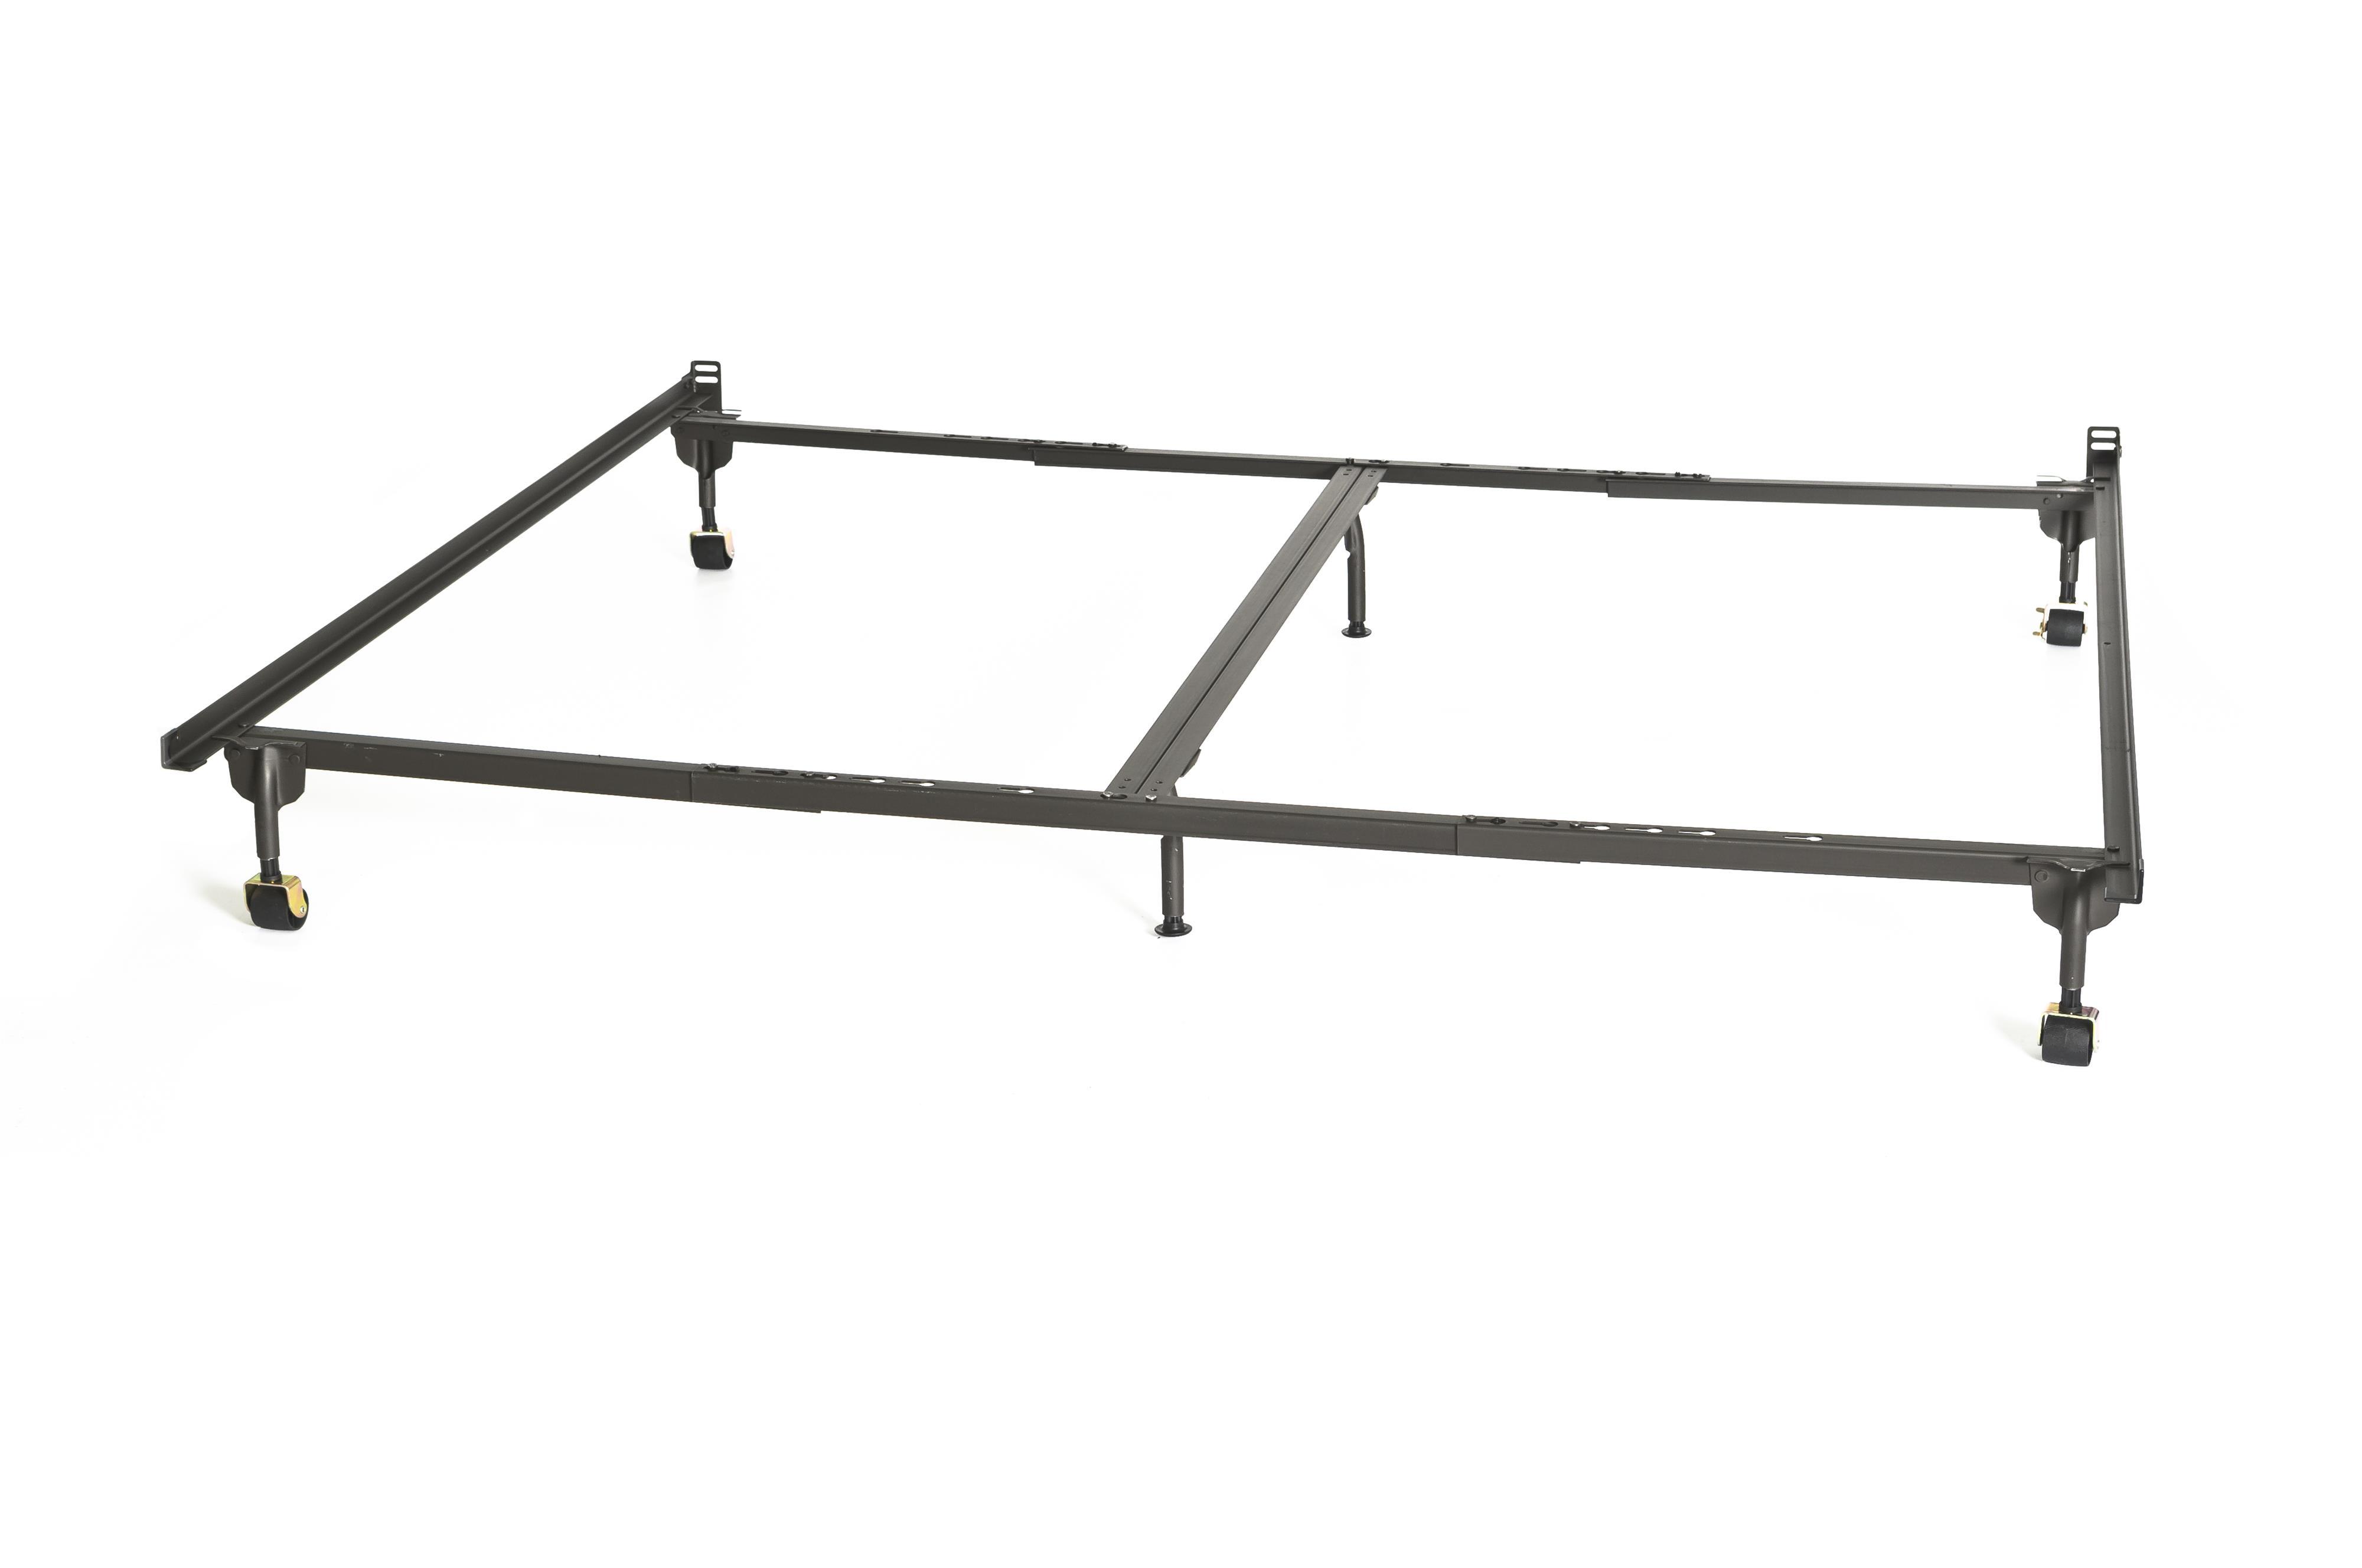 Glideaway Classic Rug Roller 6 Leg Queen/King/Cal King Rug Roller Frame - Item Number: 56R